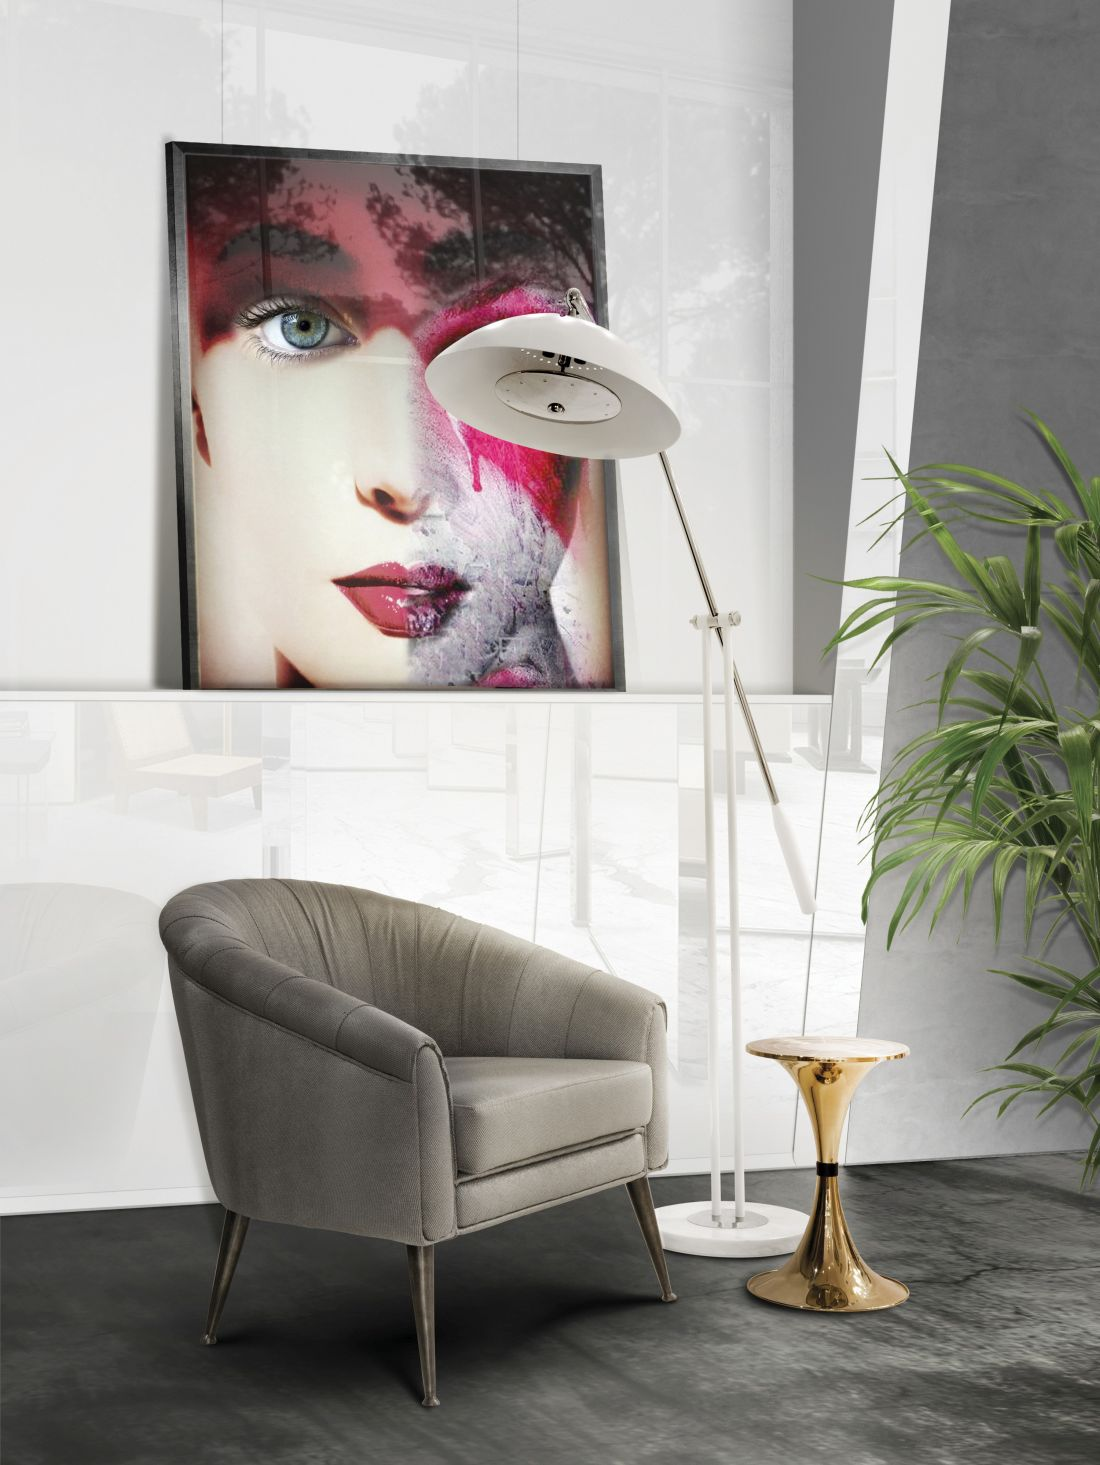 14essentialliving-room-spring-summer-decor-_-reading-corner-with-intimist-violet-ambience.jpg